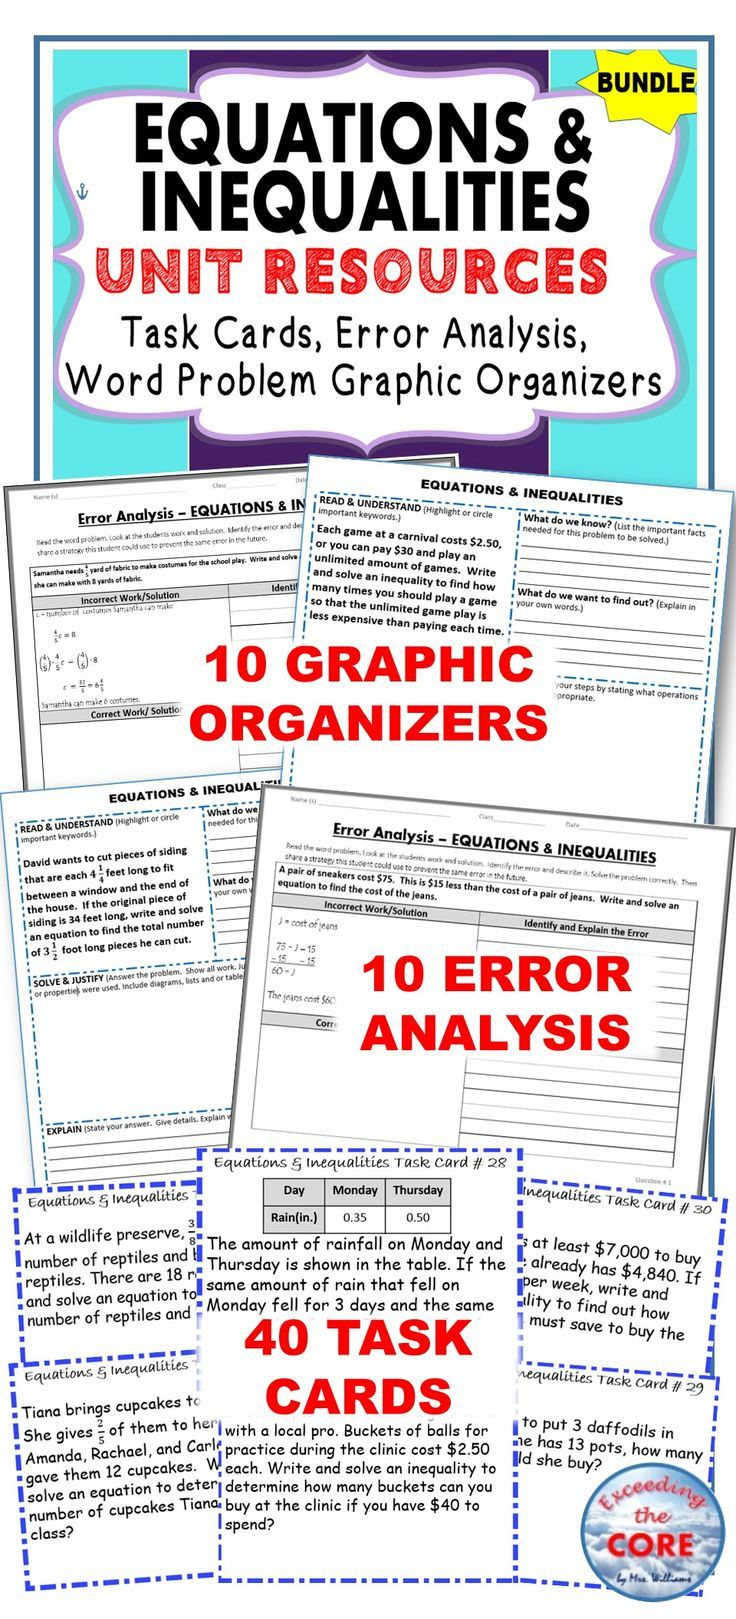 Equations inequalities task cards error analysis